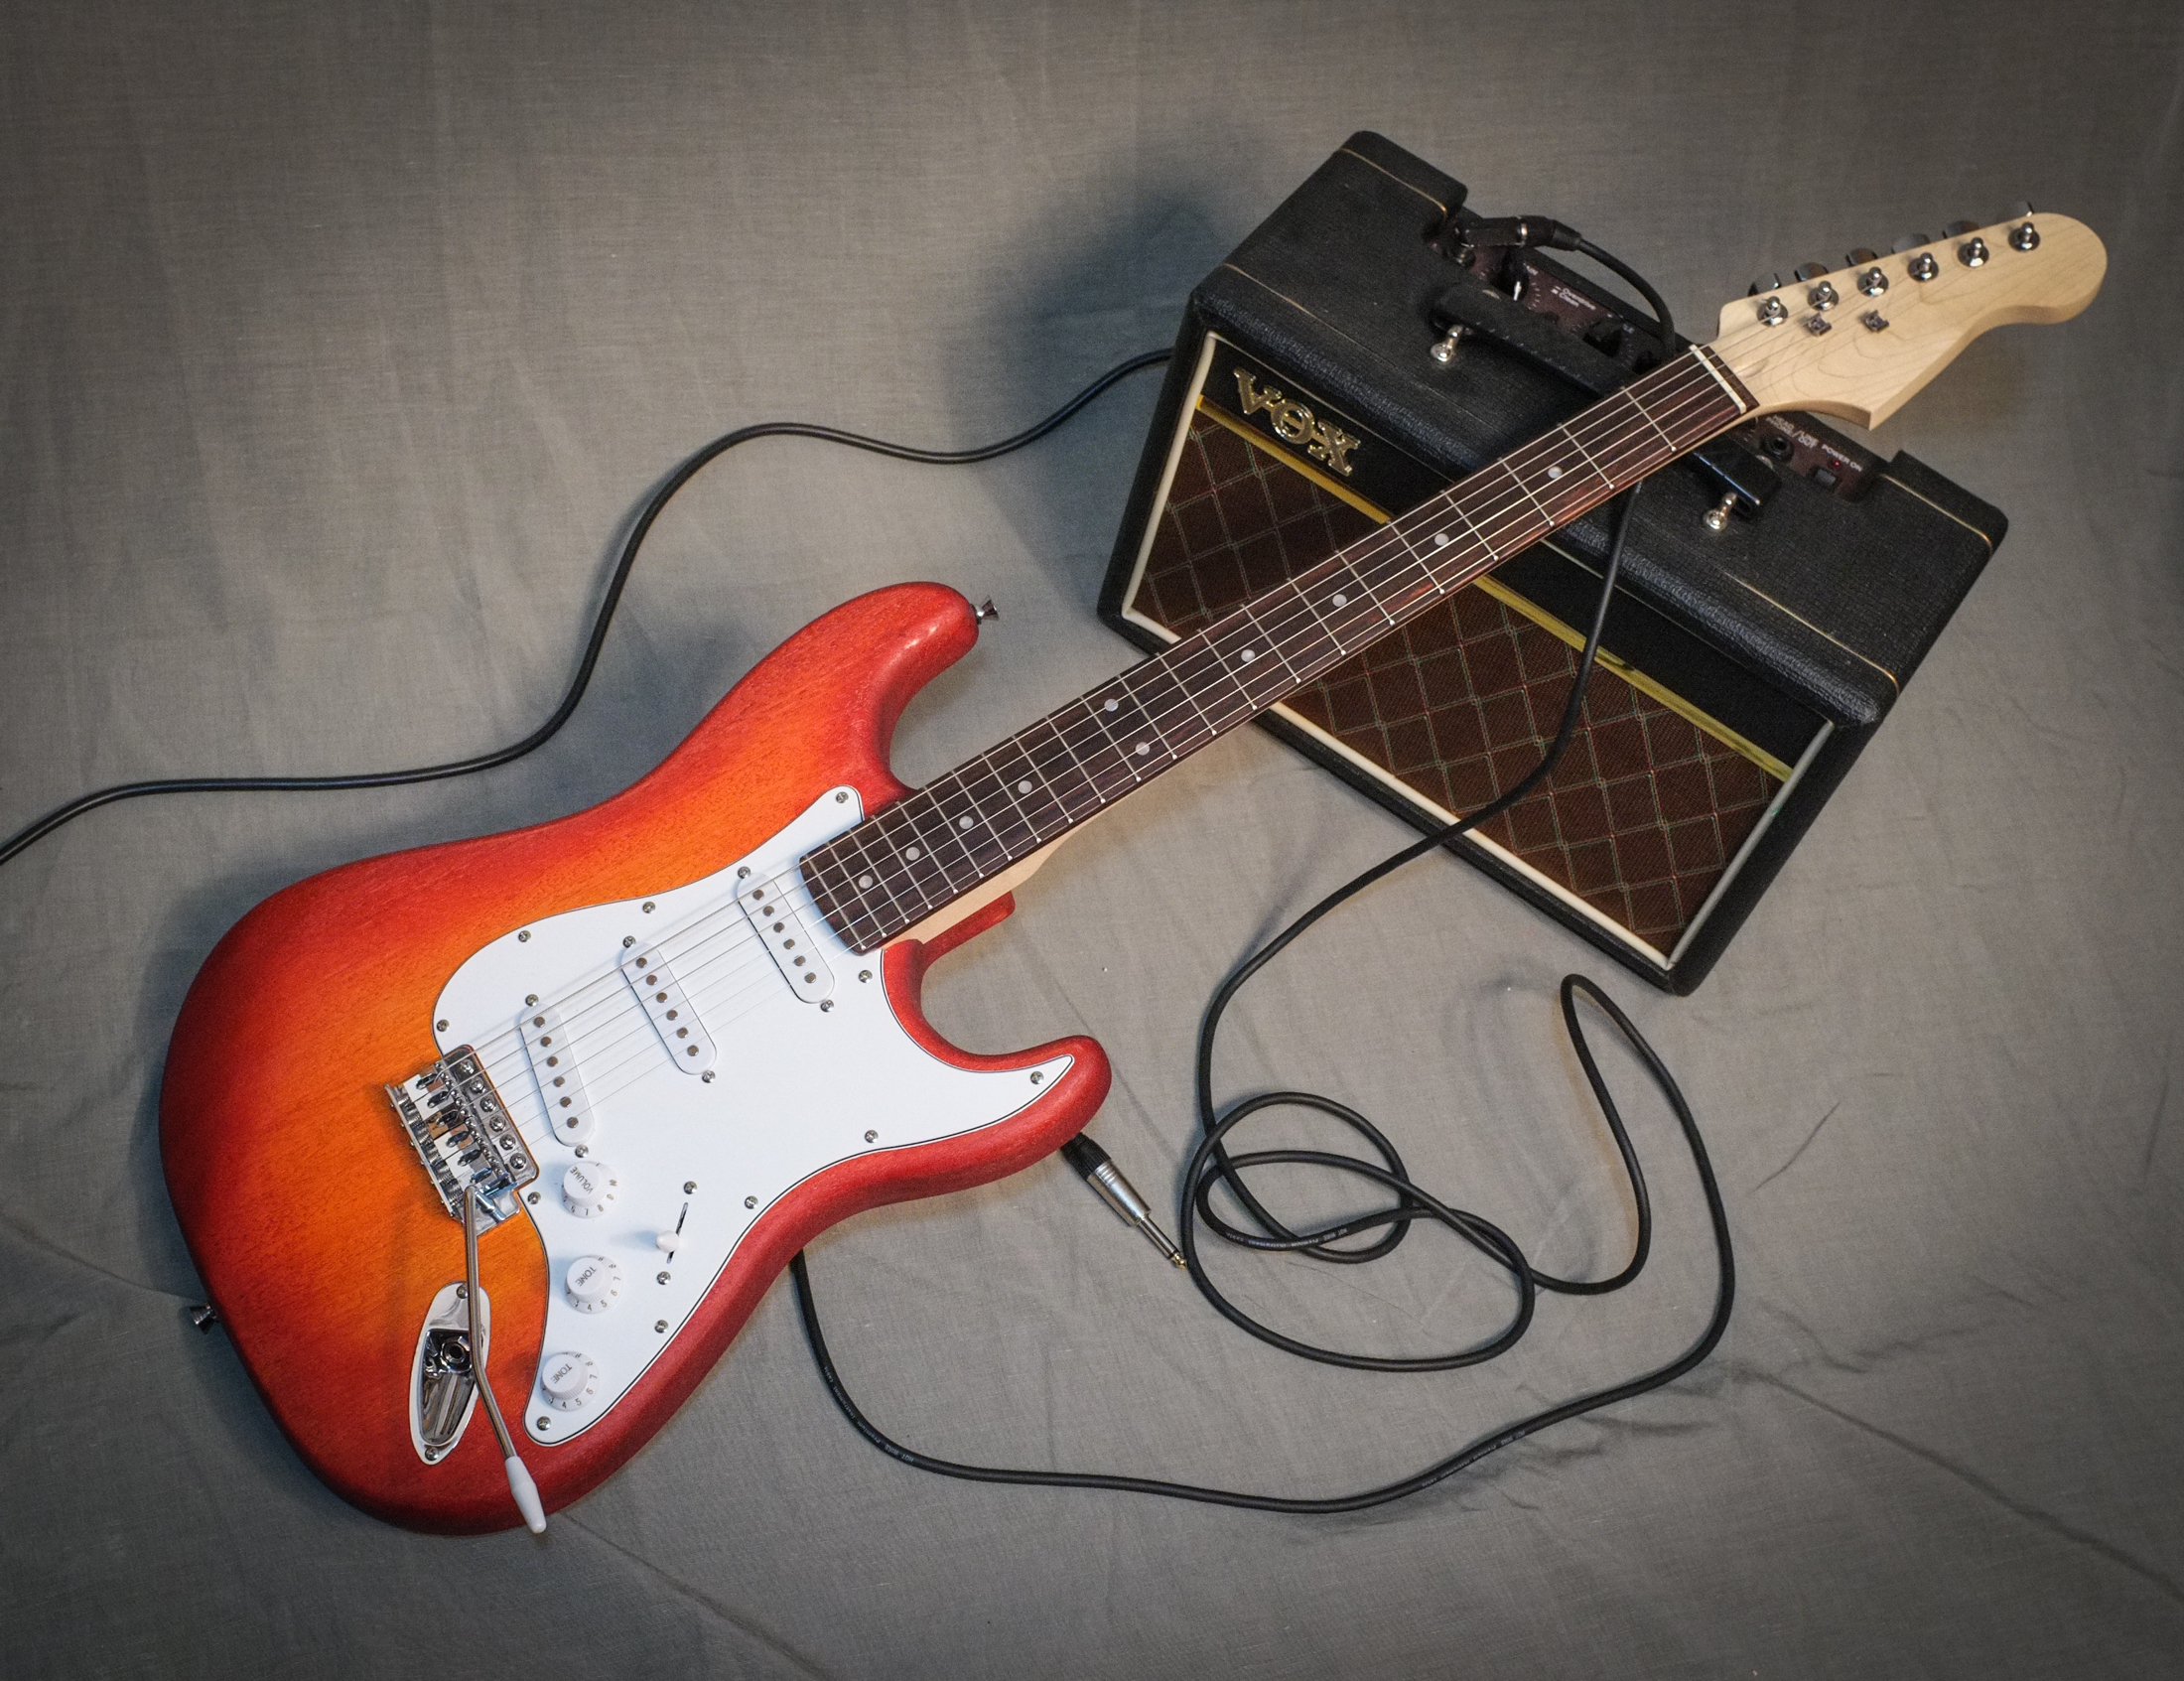 DIY-Projekt – Die eigene Gitarre